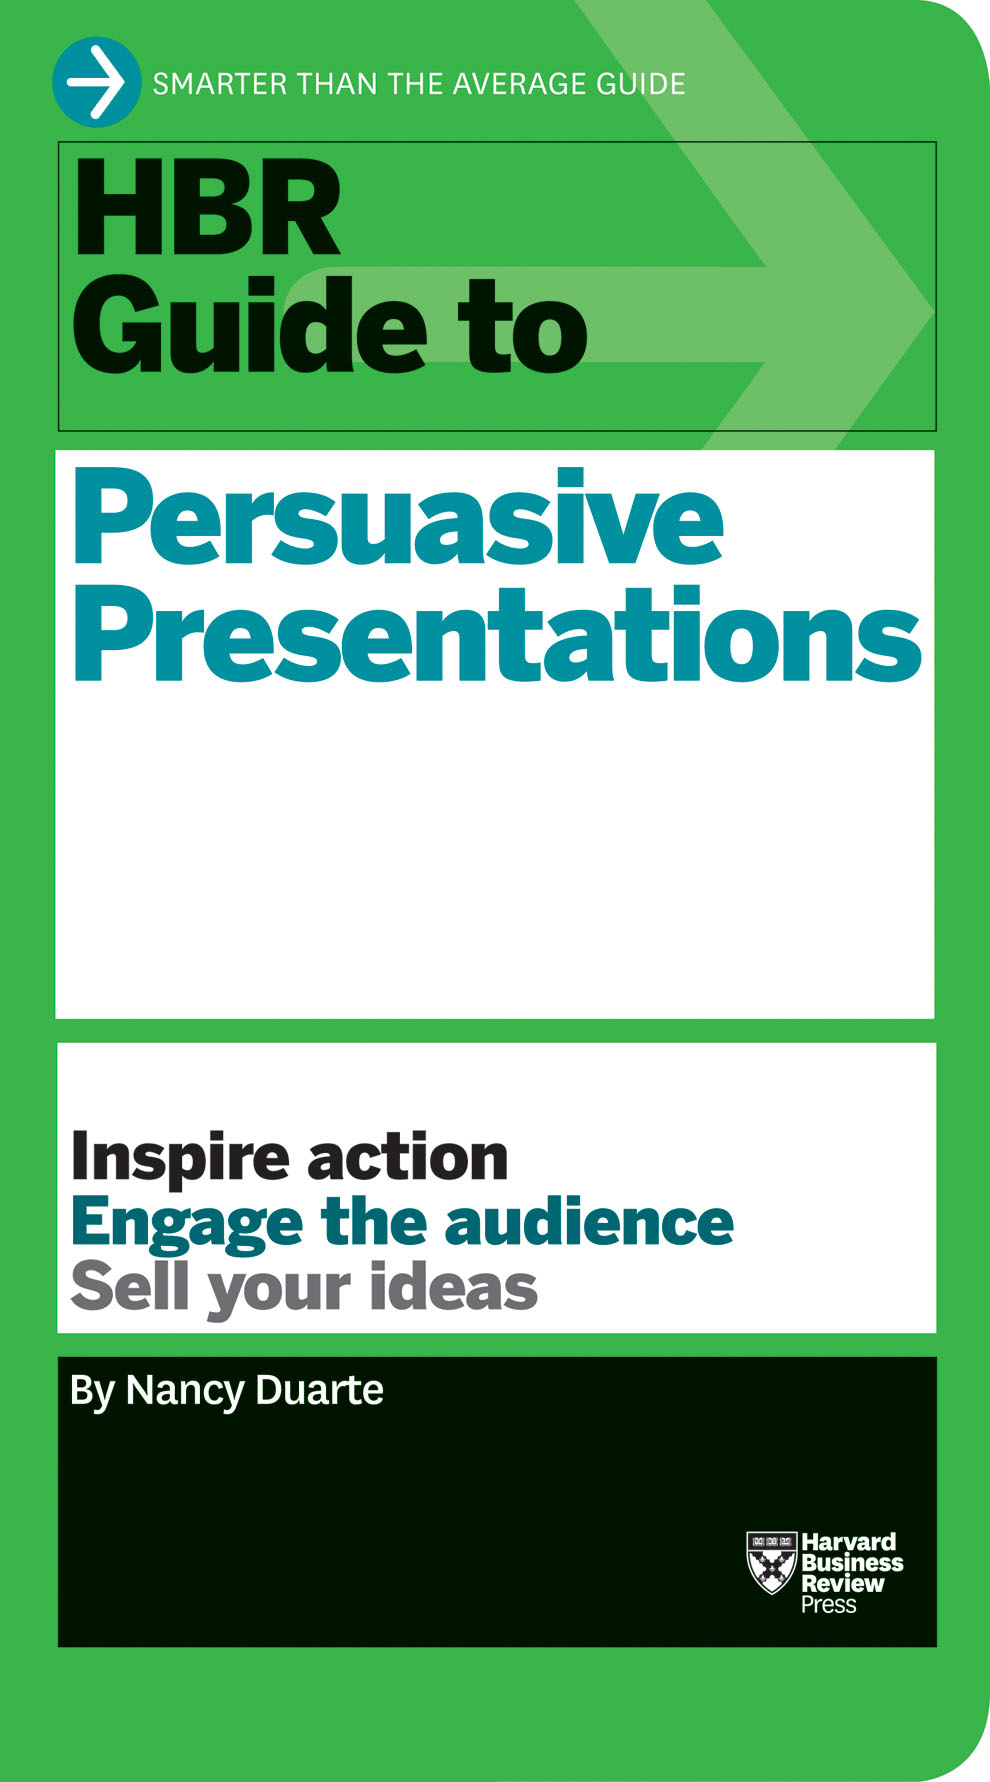 HBR Guide to Persuasive Presentations (HBR Guide Series) Nancy Duarte